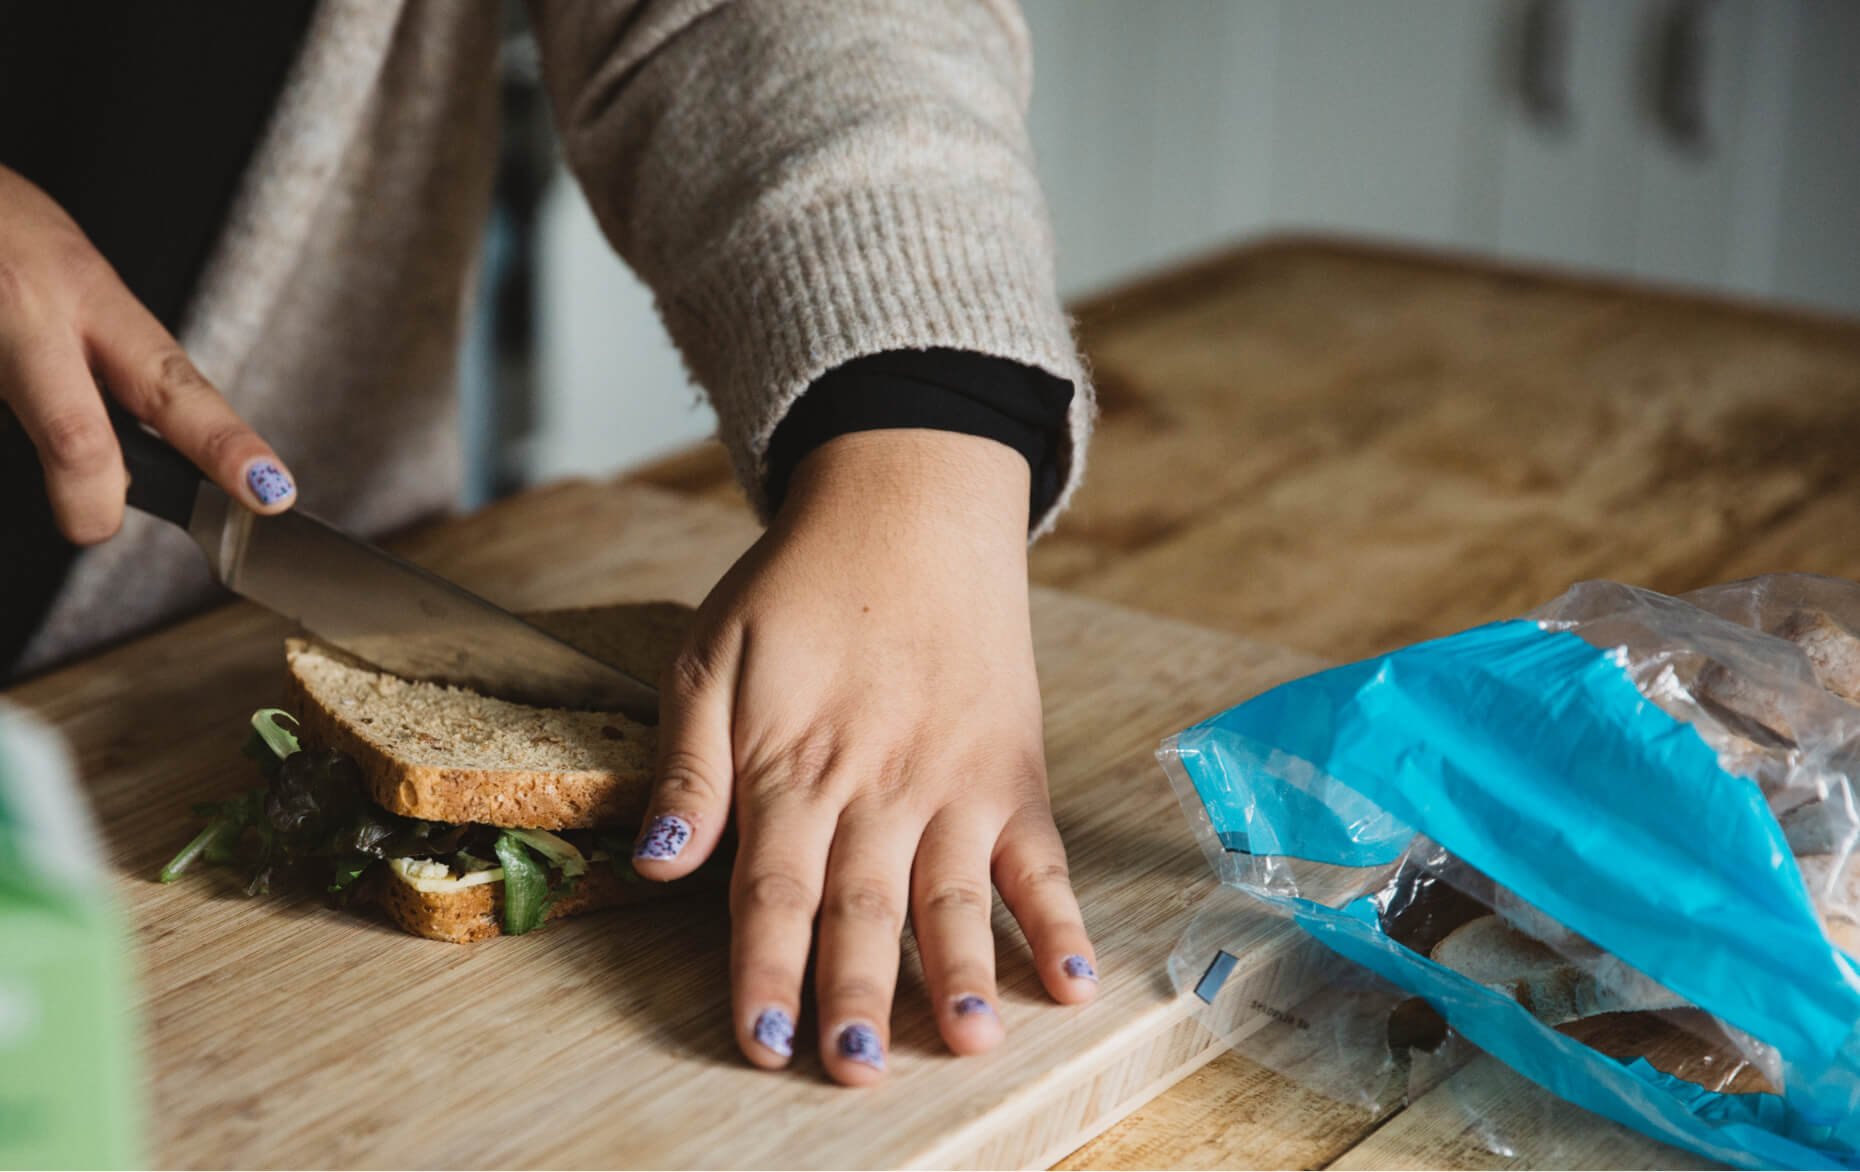 Carer cuts a sandwich on a wooden chopping board